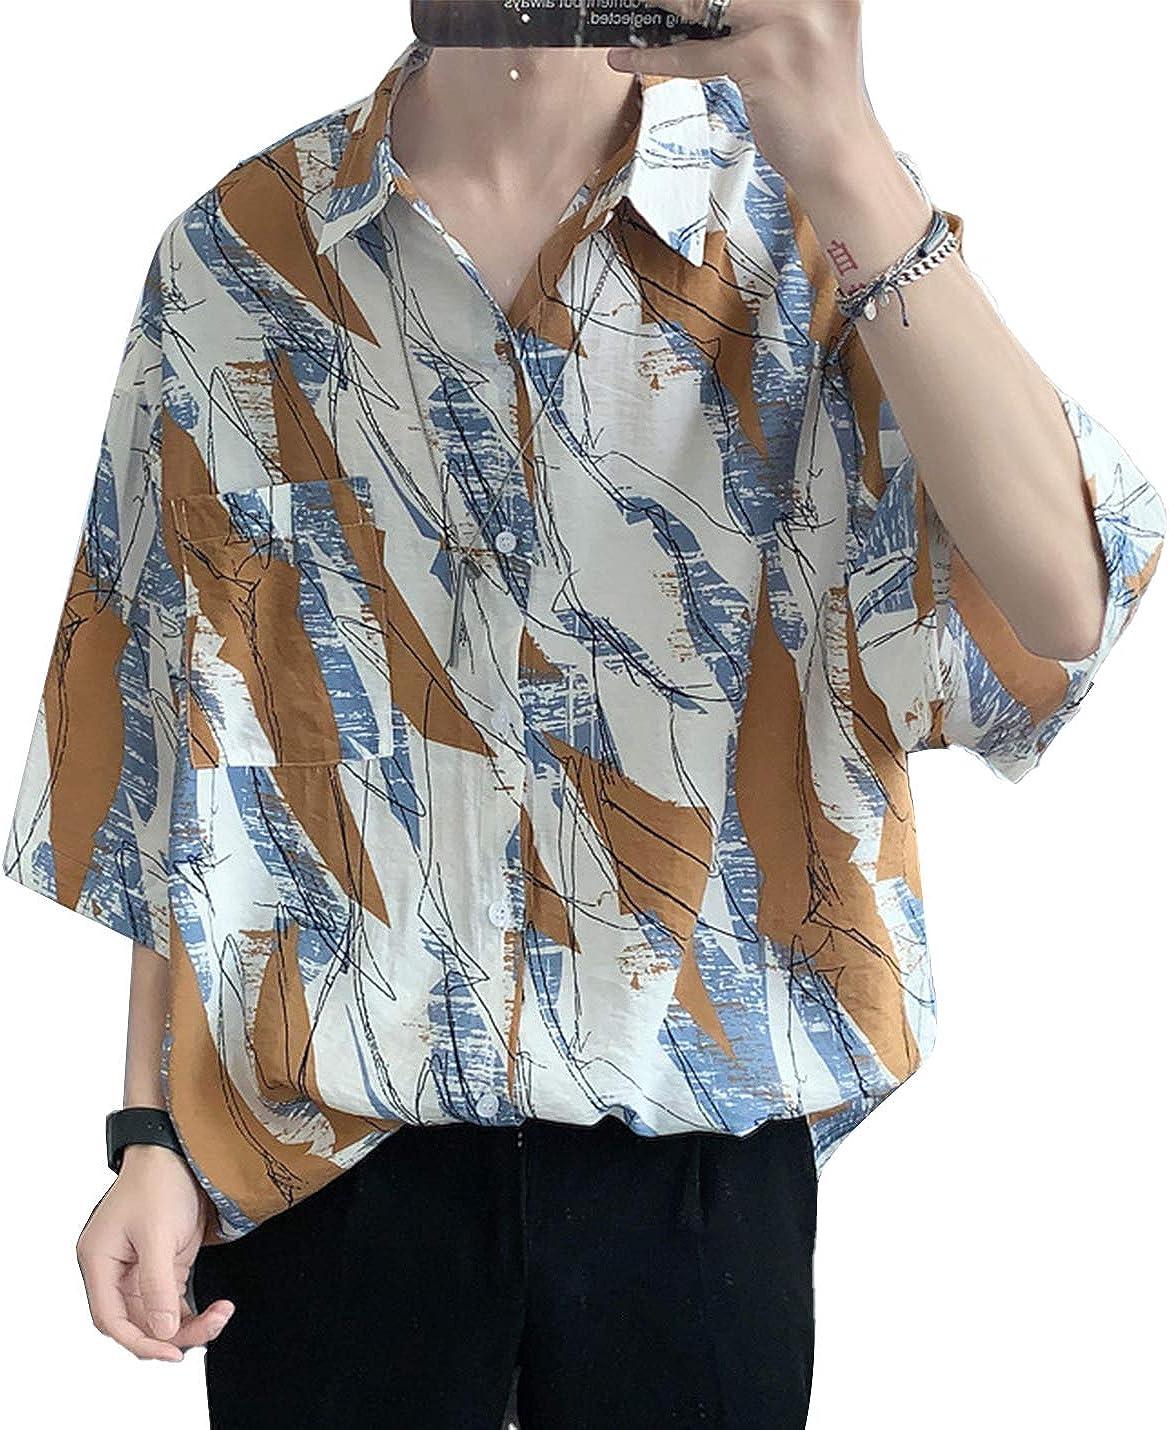 PEHMEA Men's Loose Shirt Casual Short Sleeve Button Down Floral Printed Beach Shirts